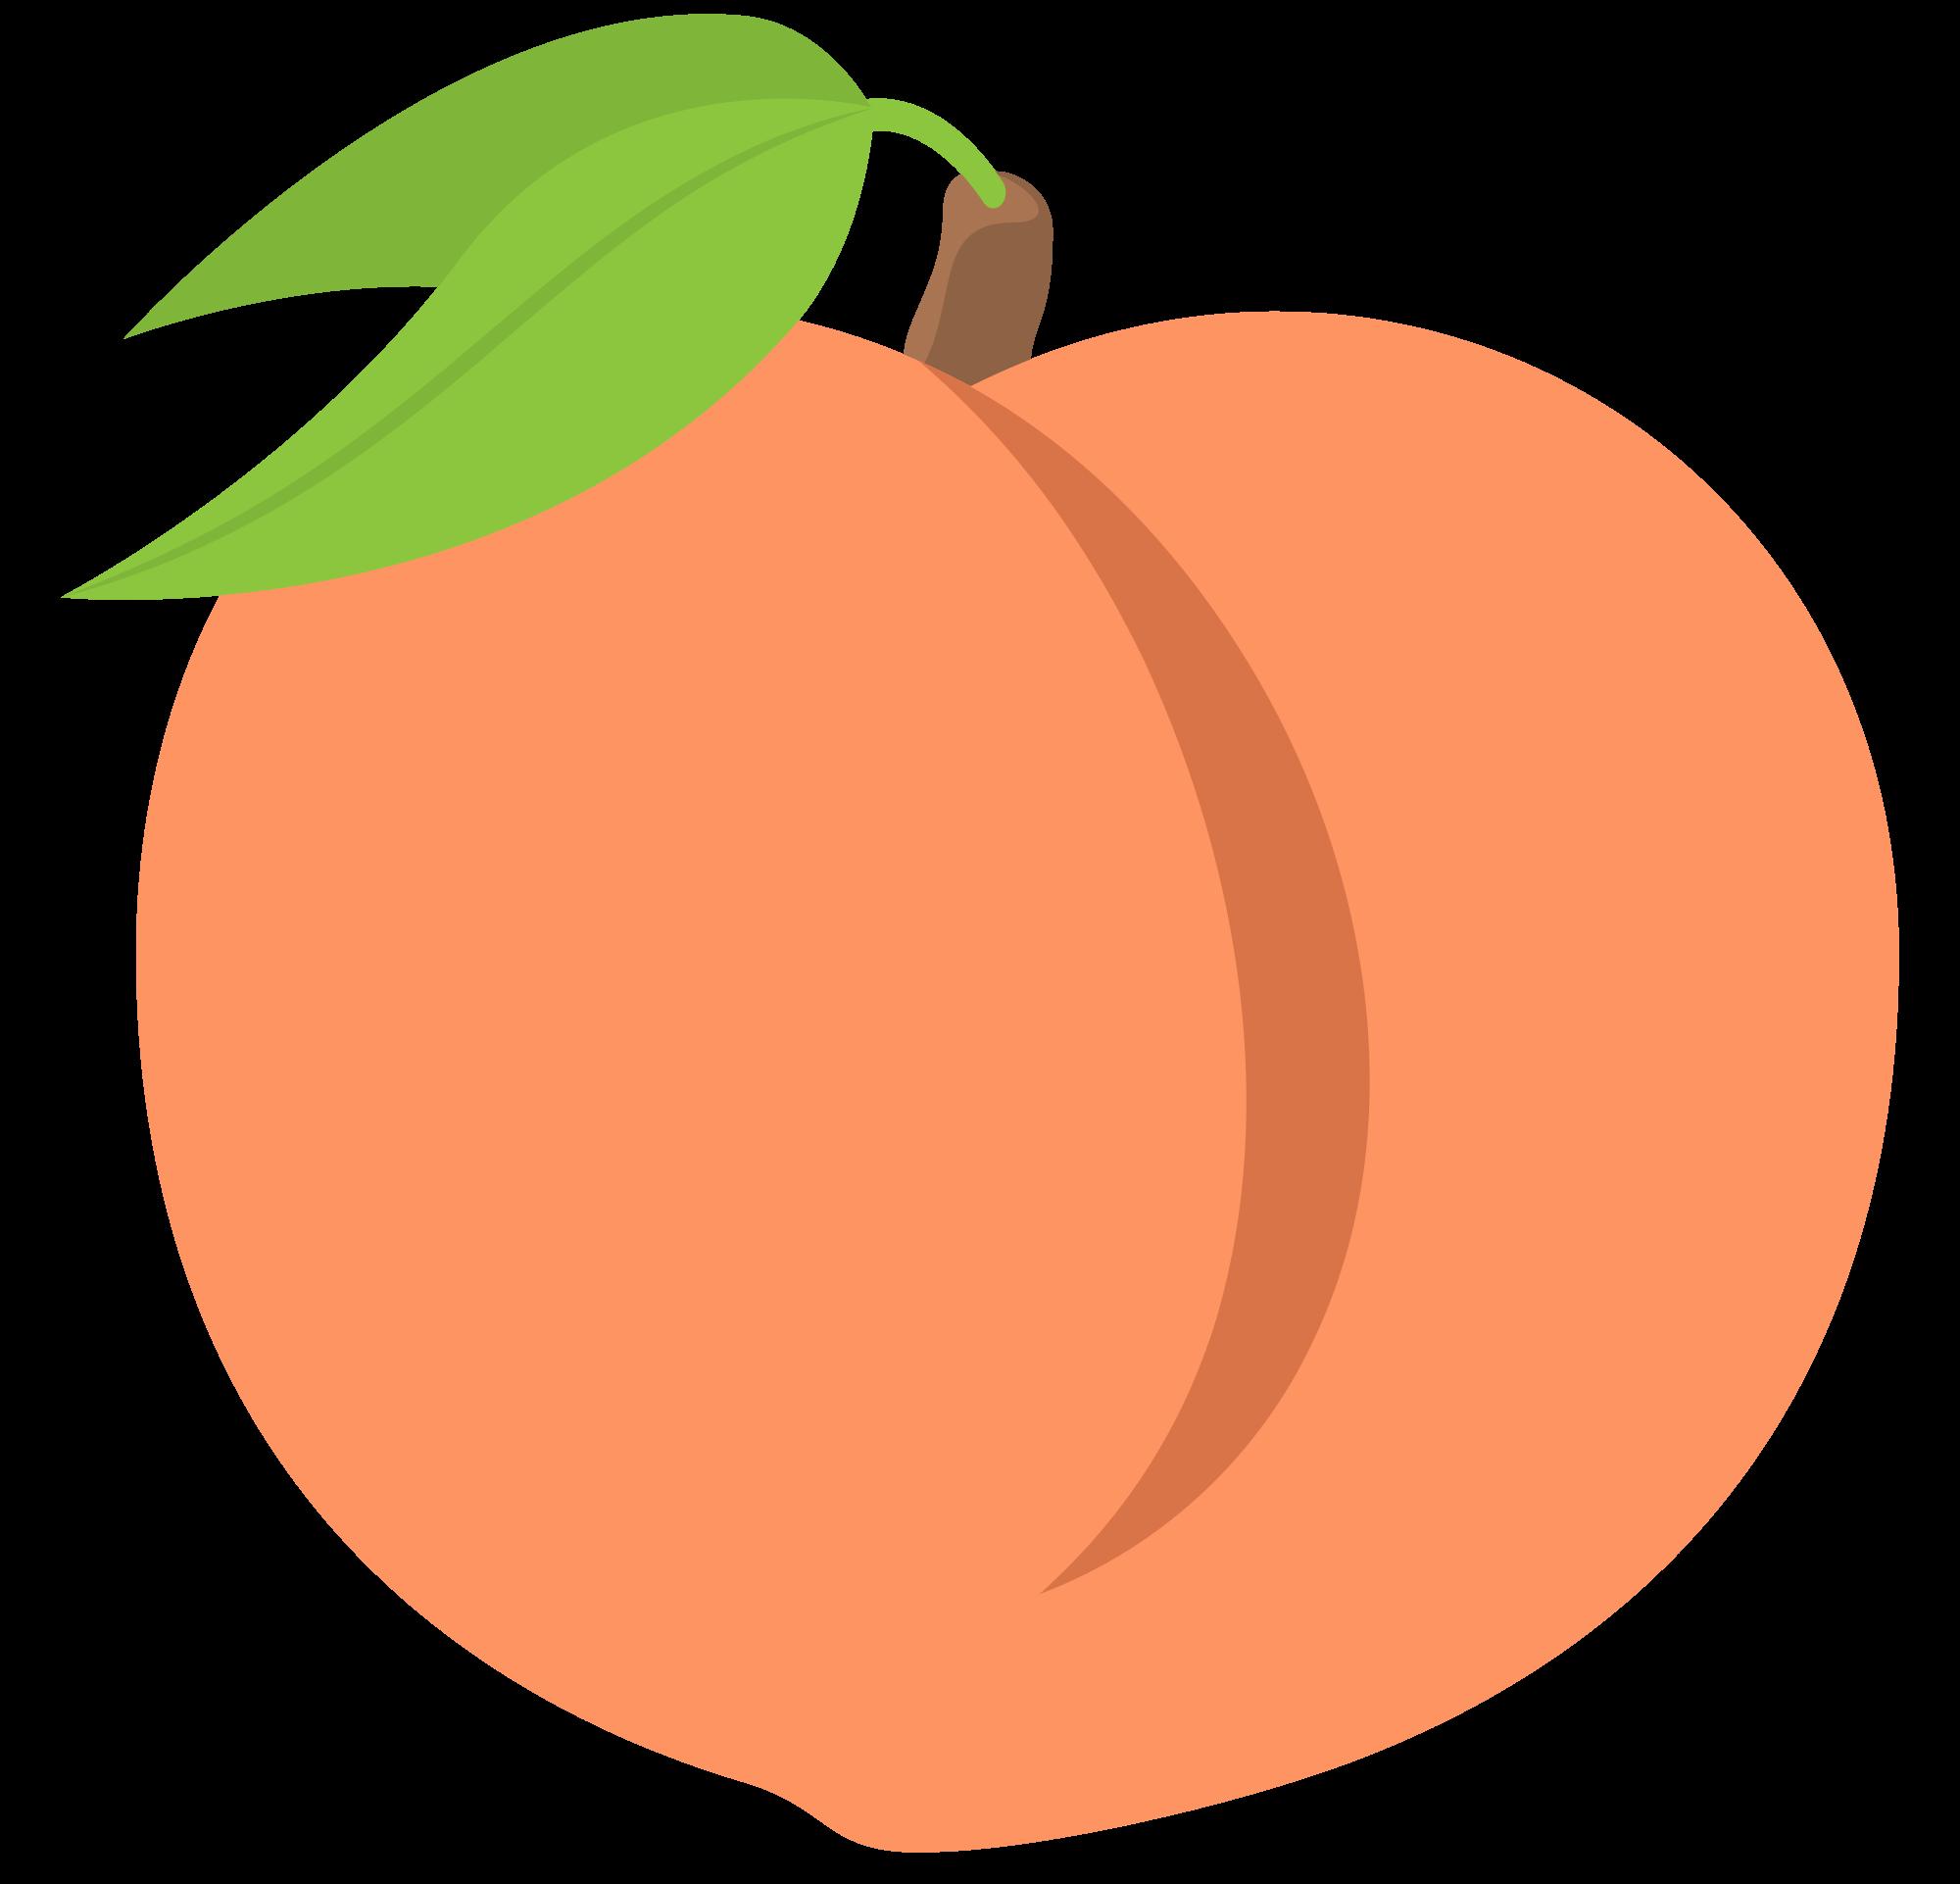 Peaches productions . Peach clipart svg